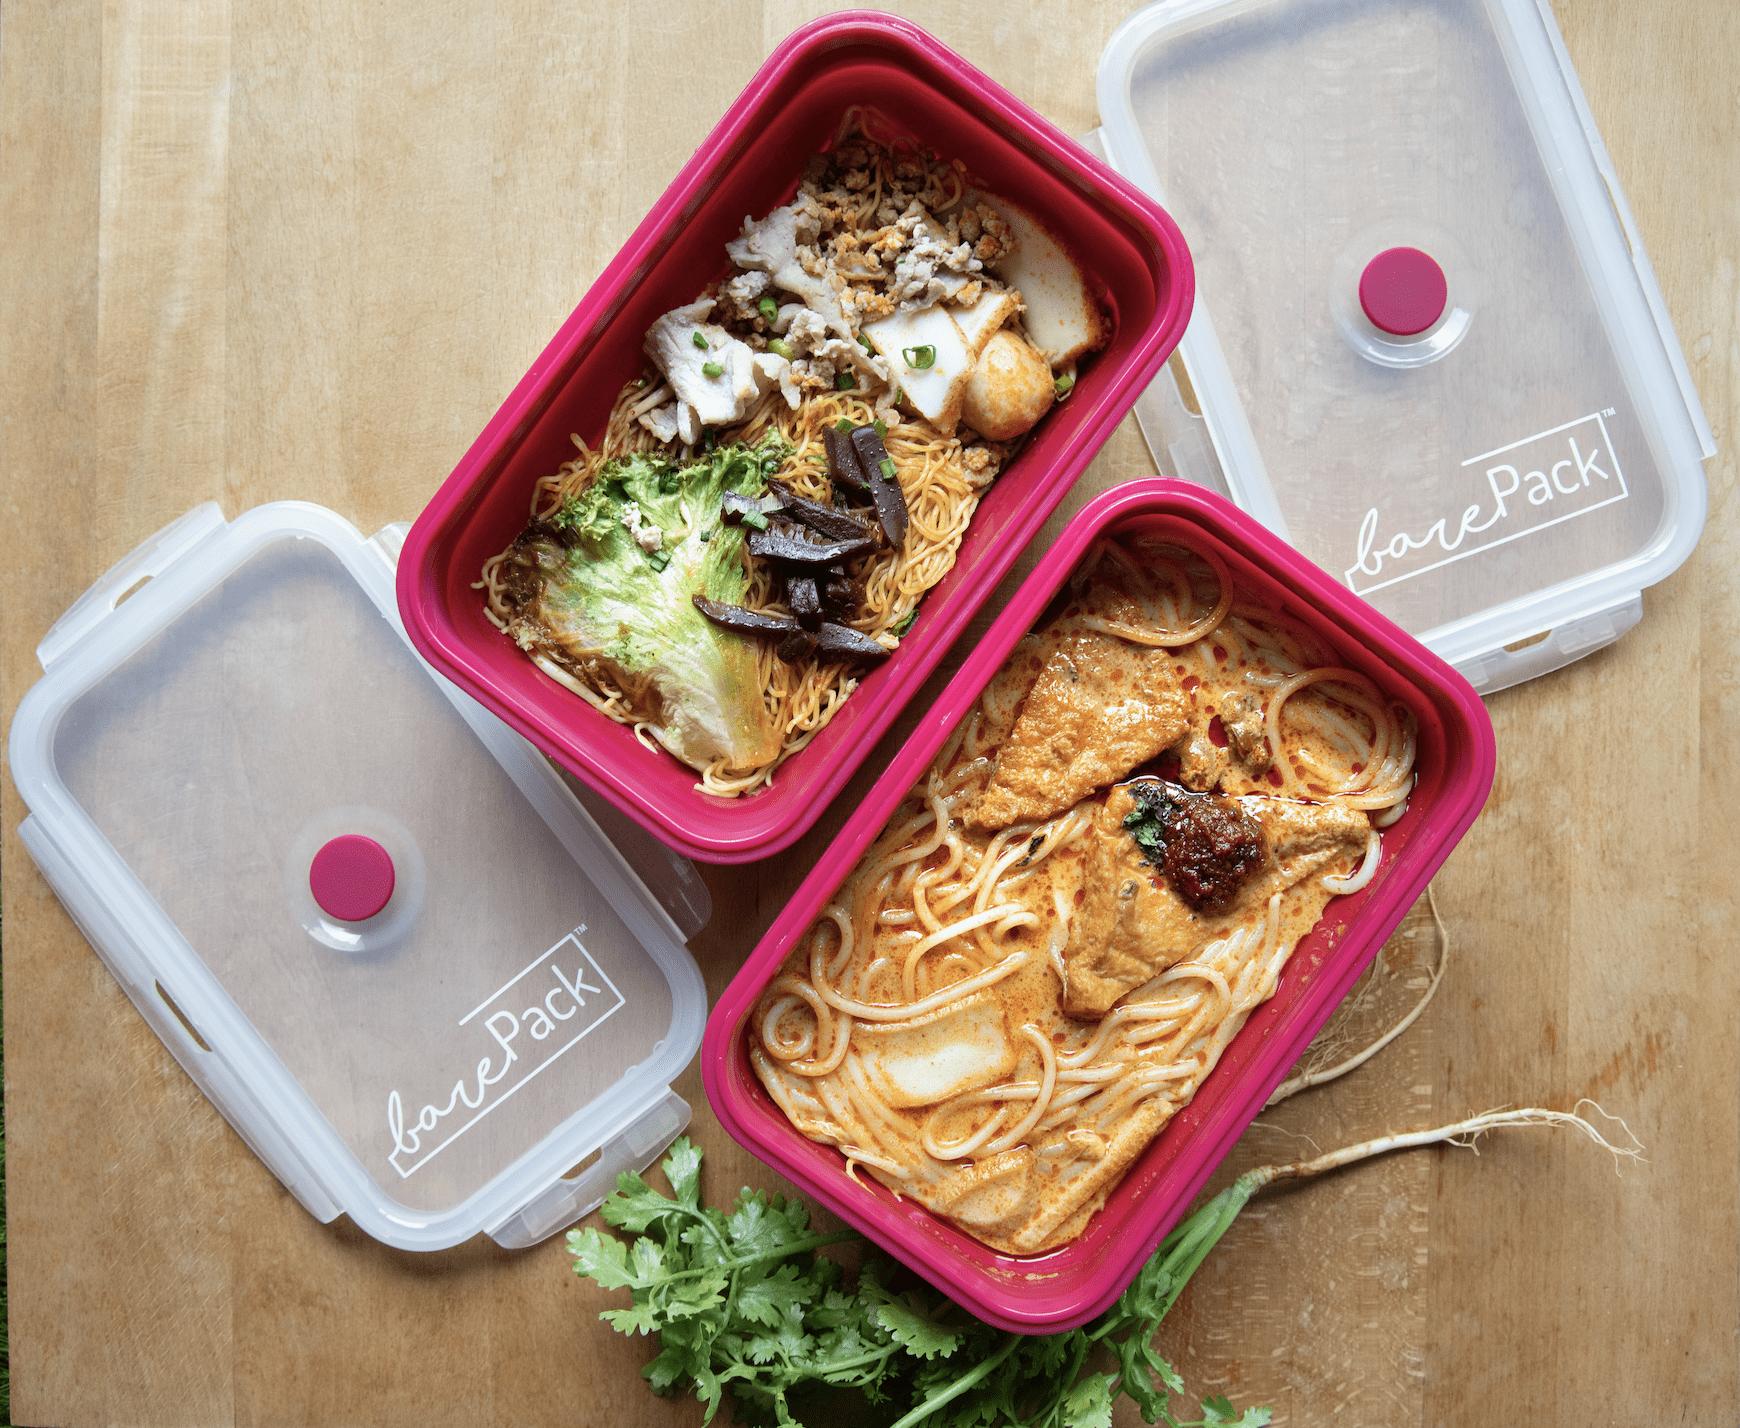 foodpanda reusable container